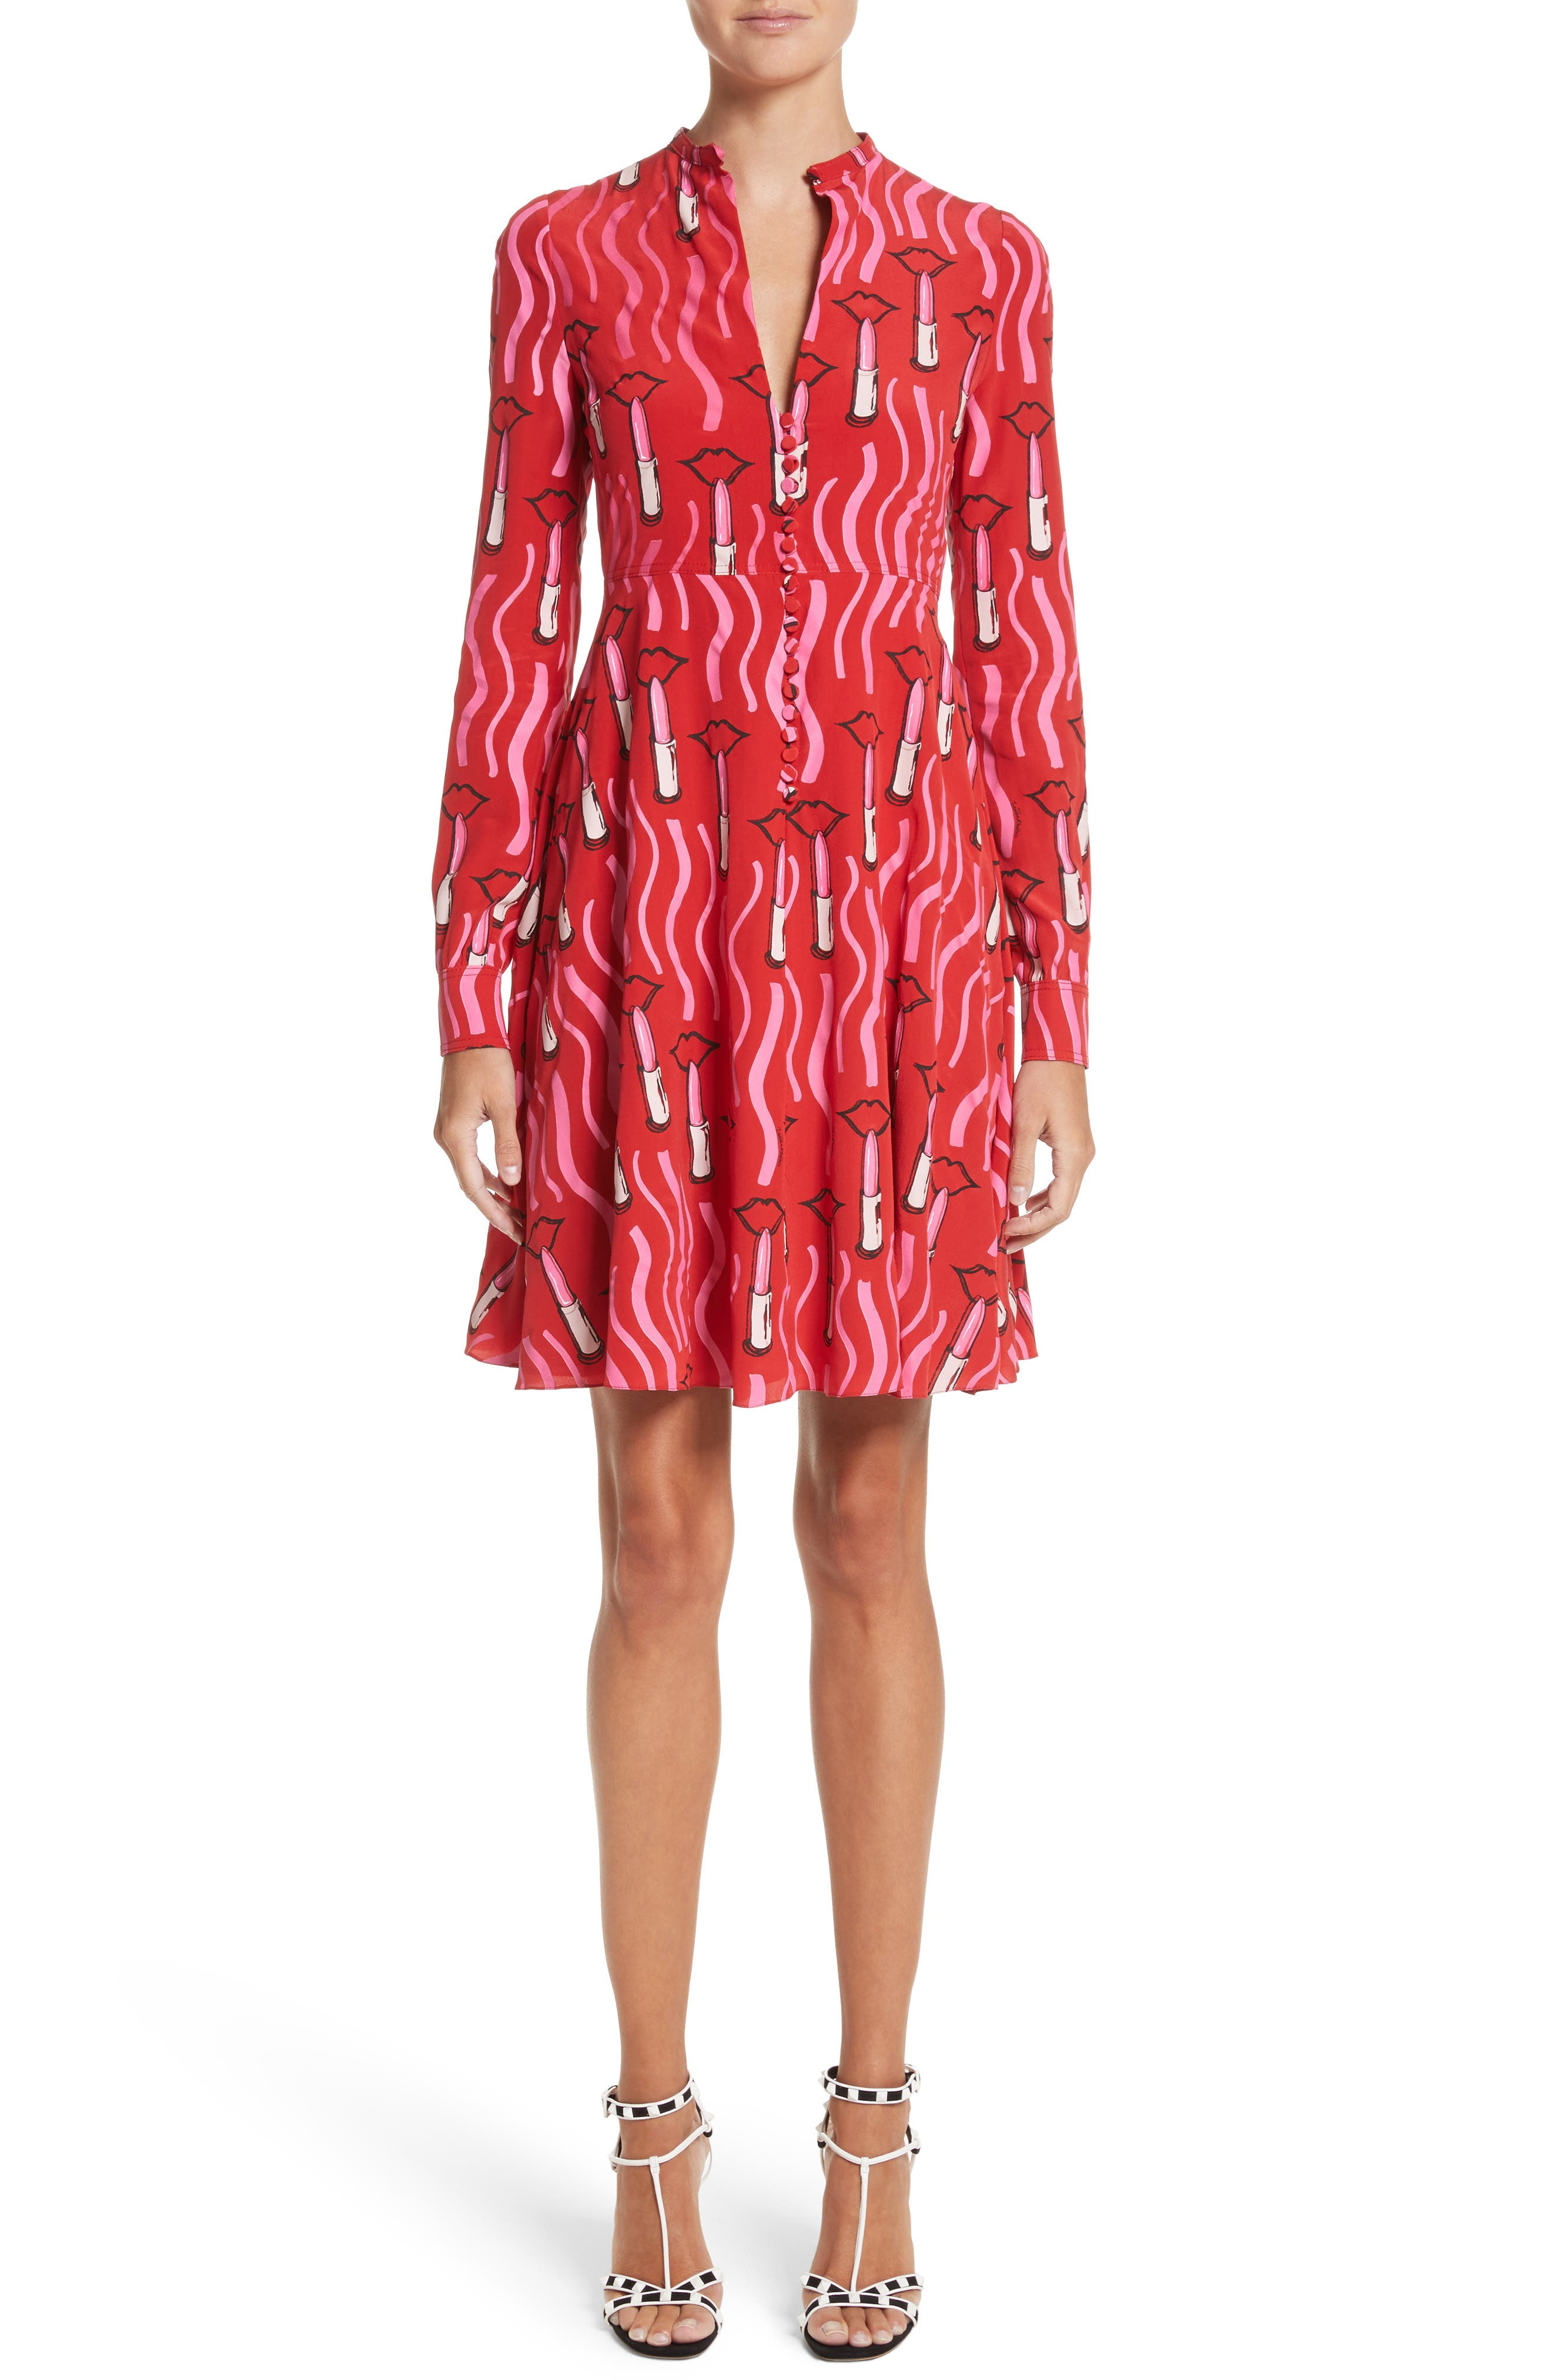 Alternate Image 1 Selected - Valentino Lipstick Print Silk Fit & Flare Dress